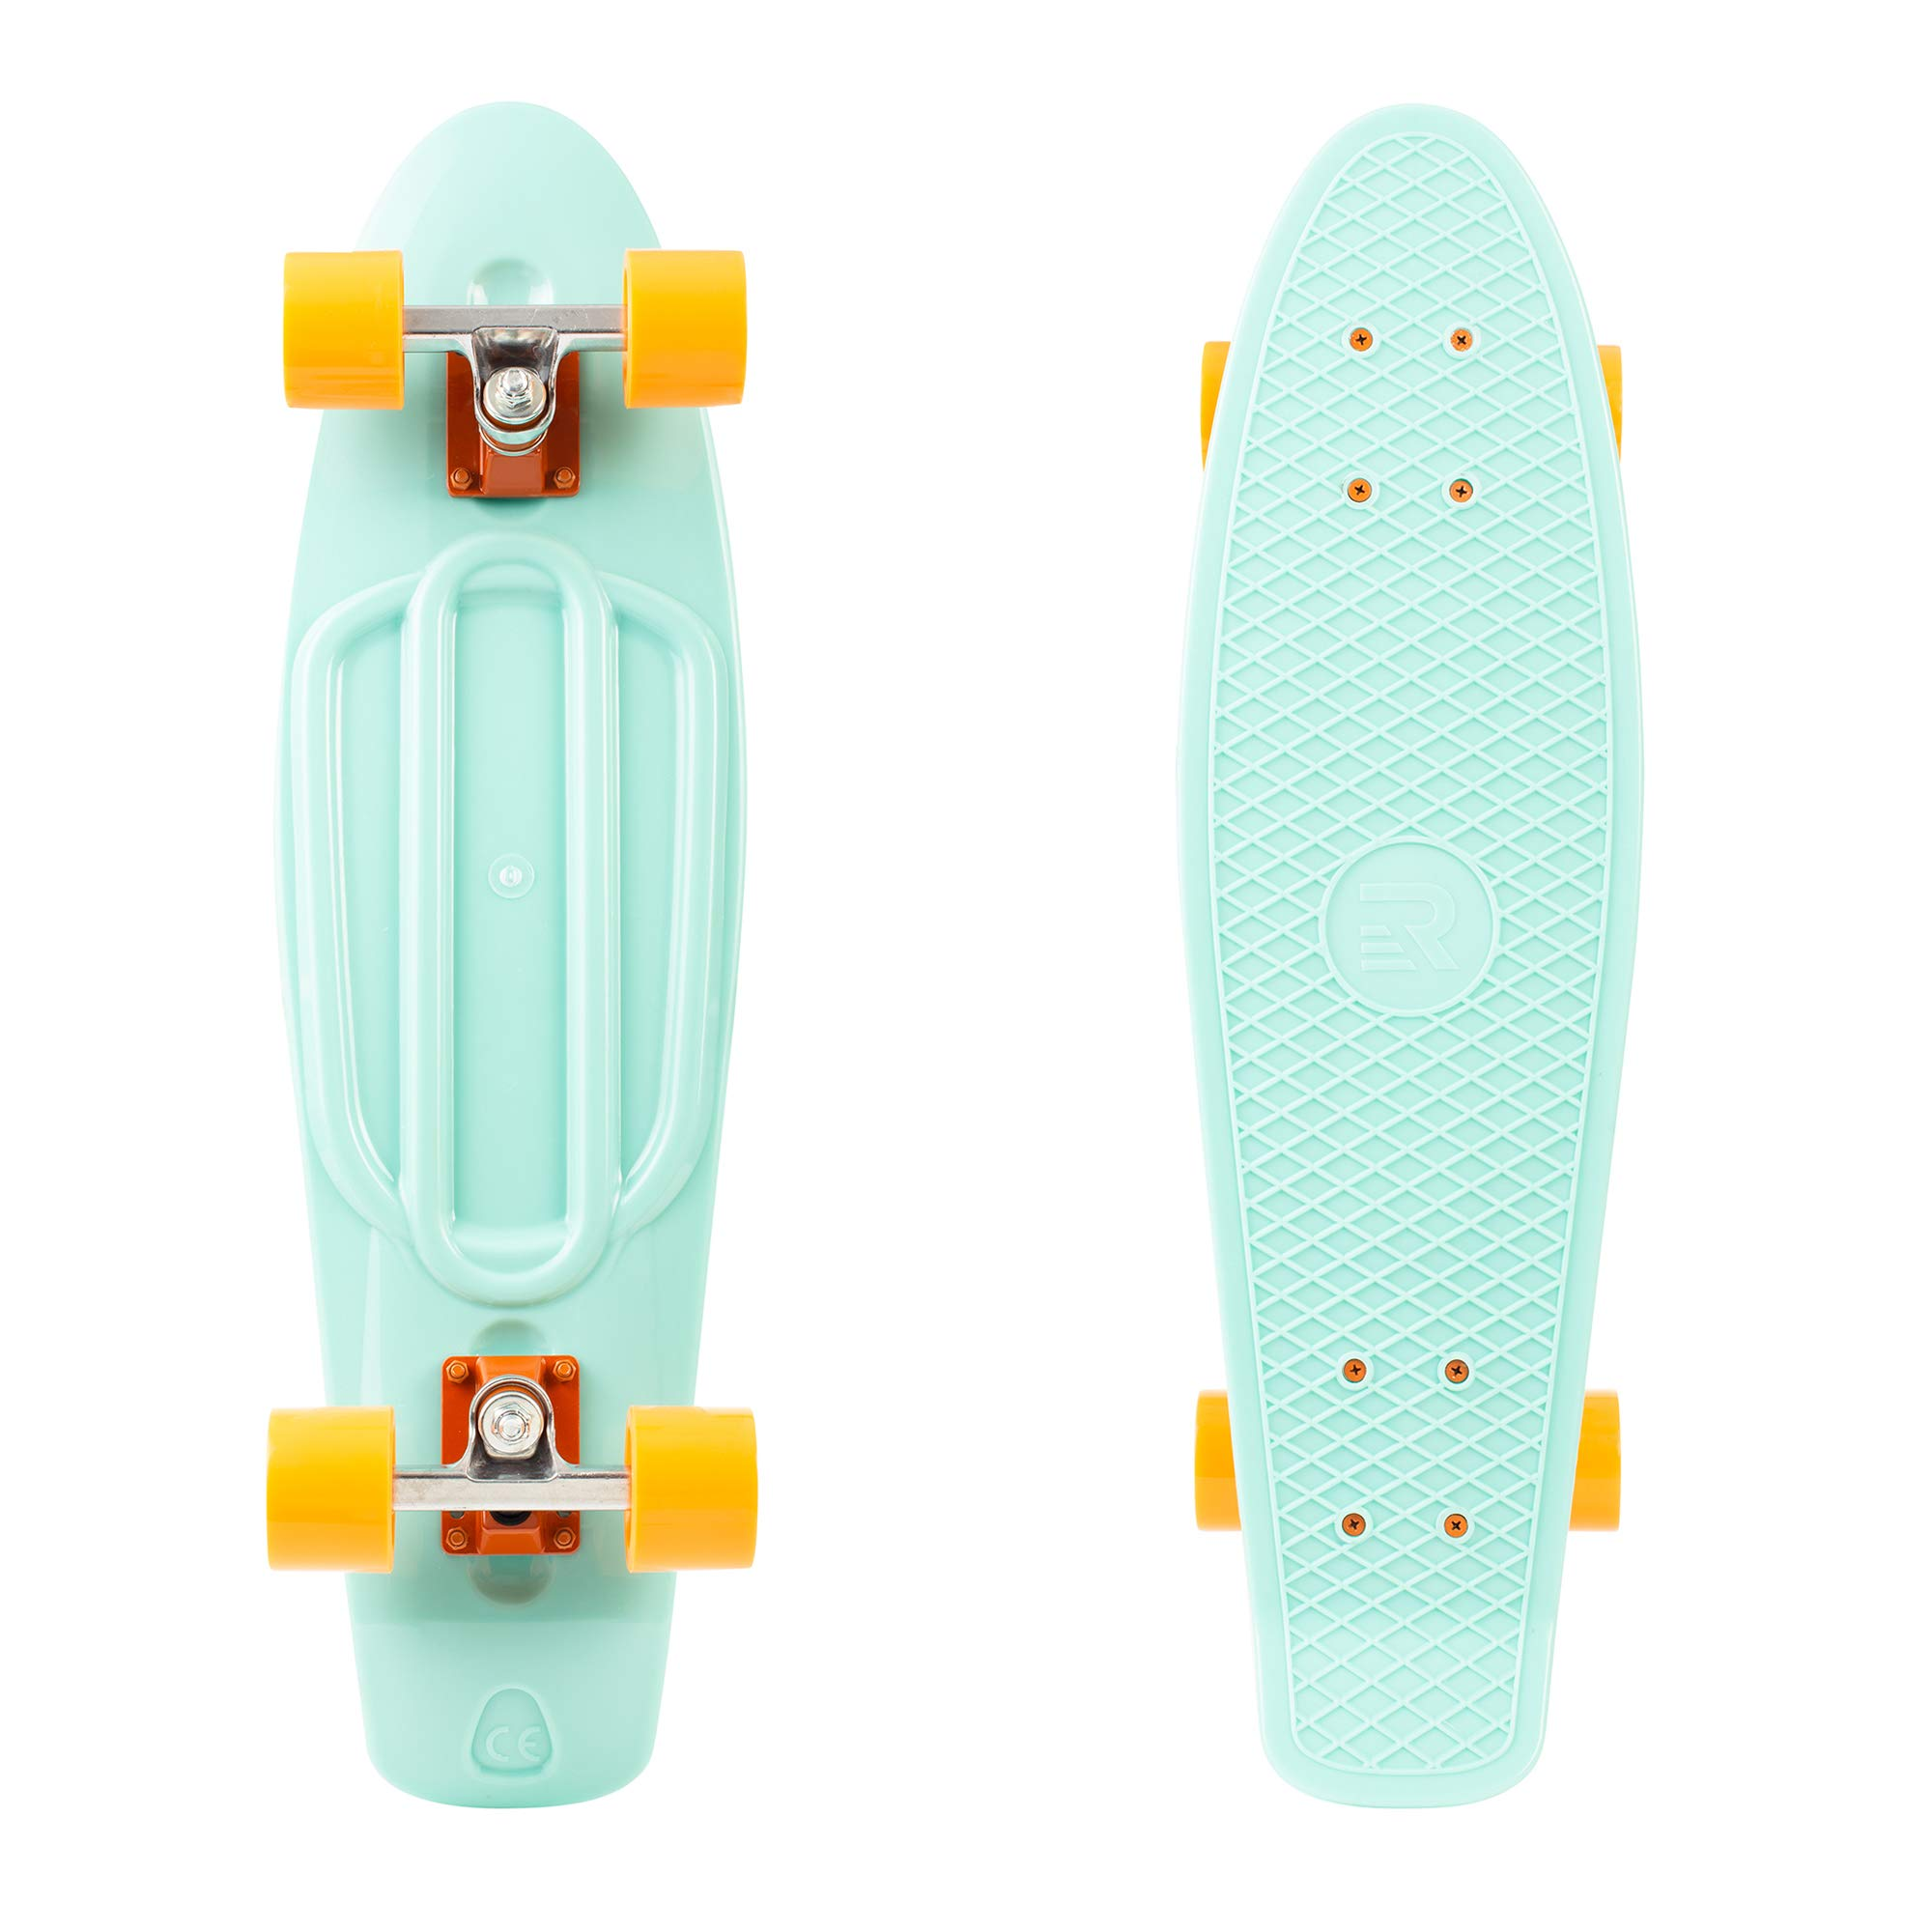 Retrospec Quip Skateboard Classic Retro Plastic Cruiser Complete Skateboard